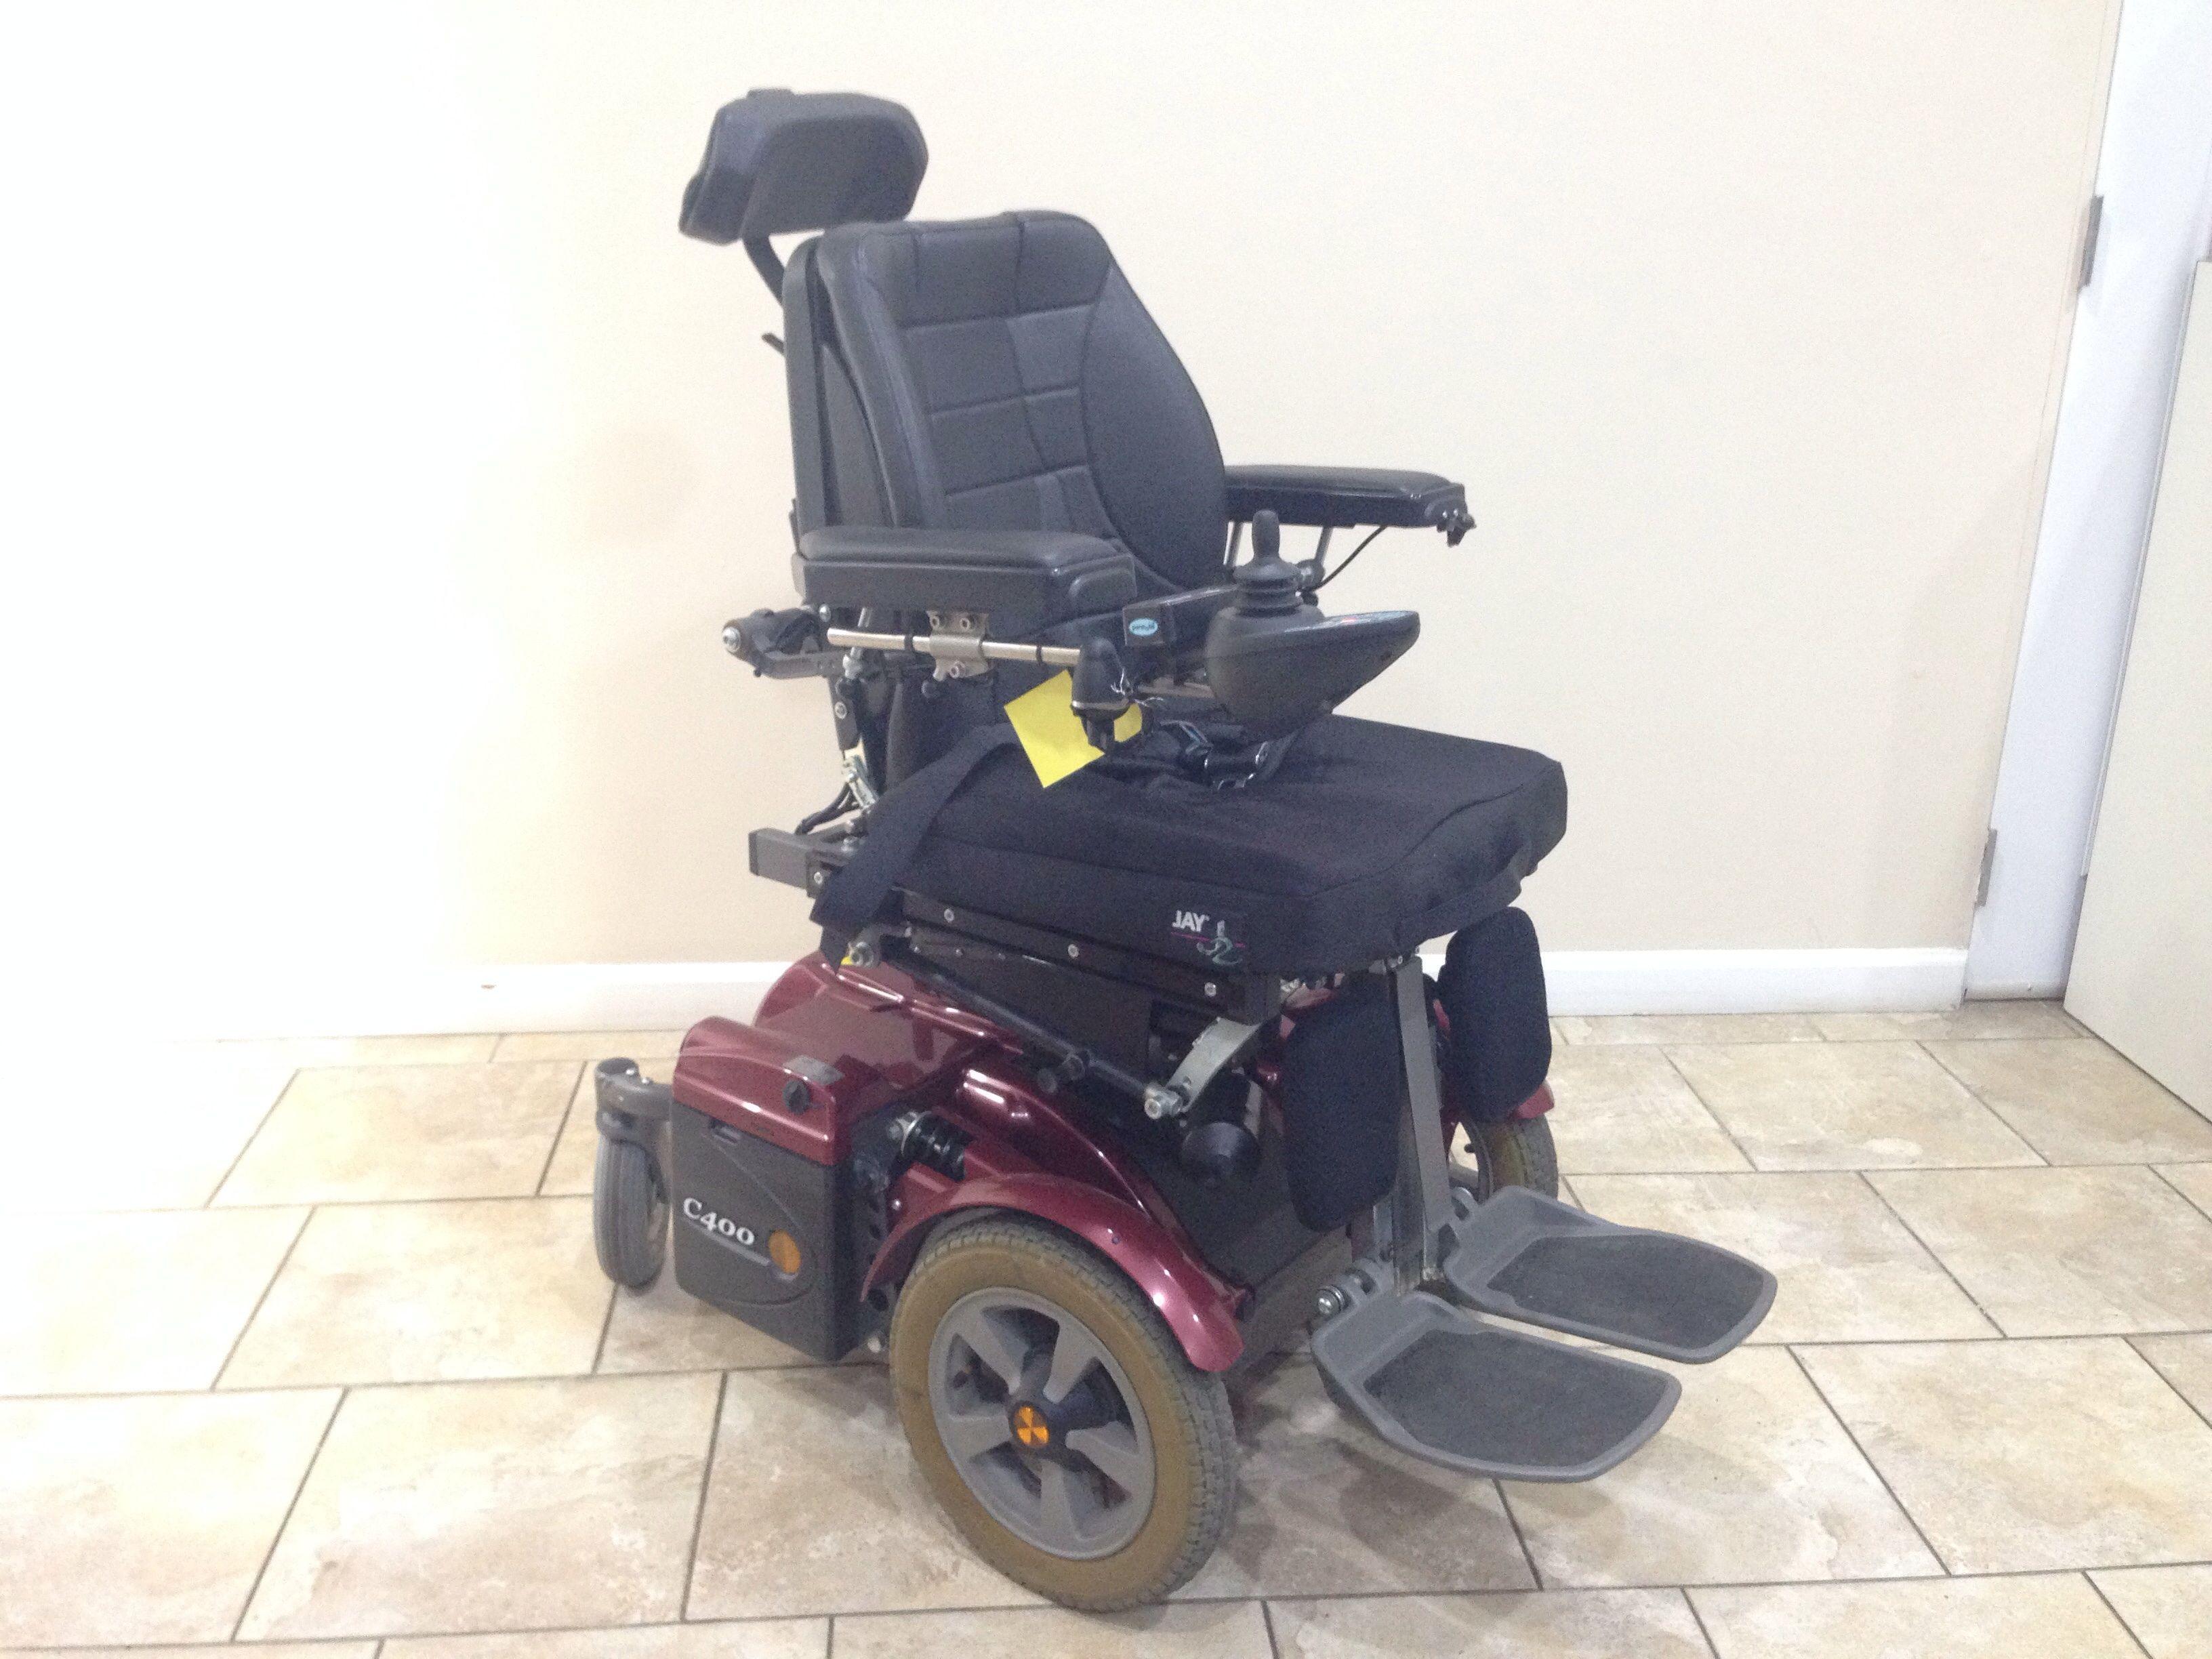 electrical wiring diagrams prmobil wheelchair c400